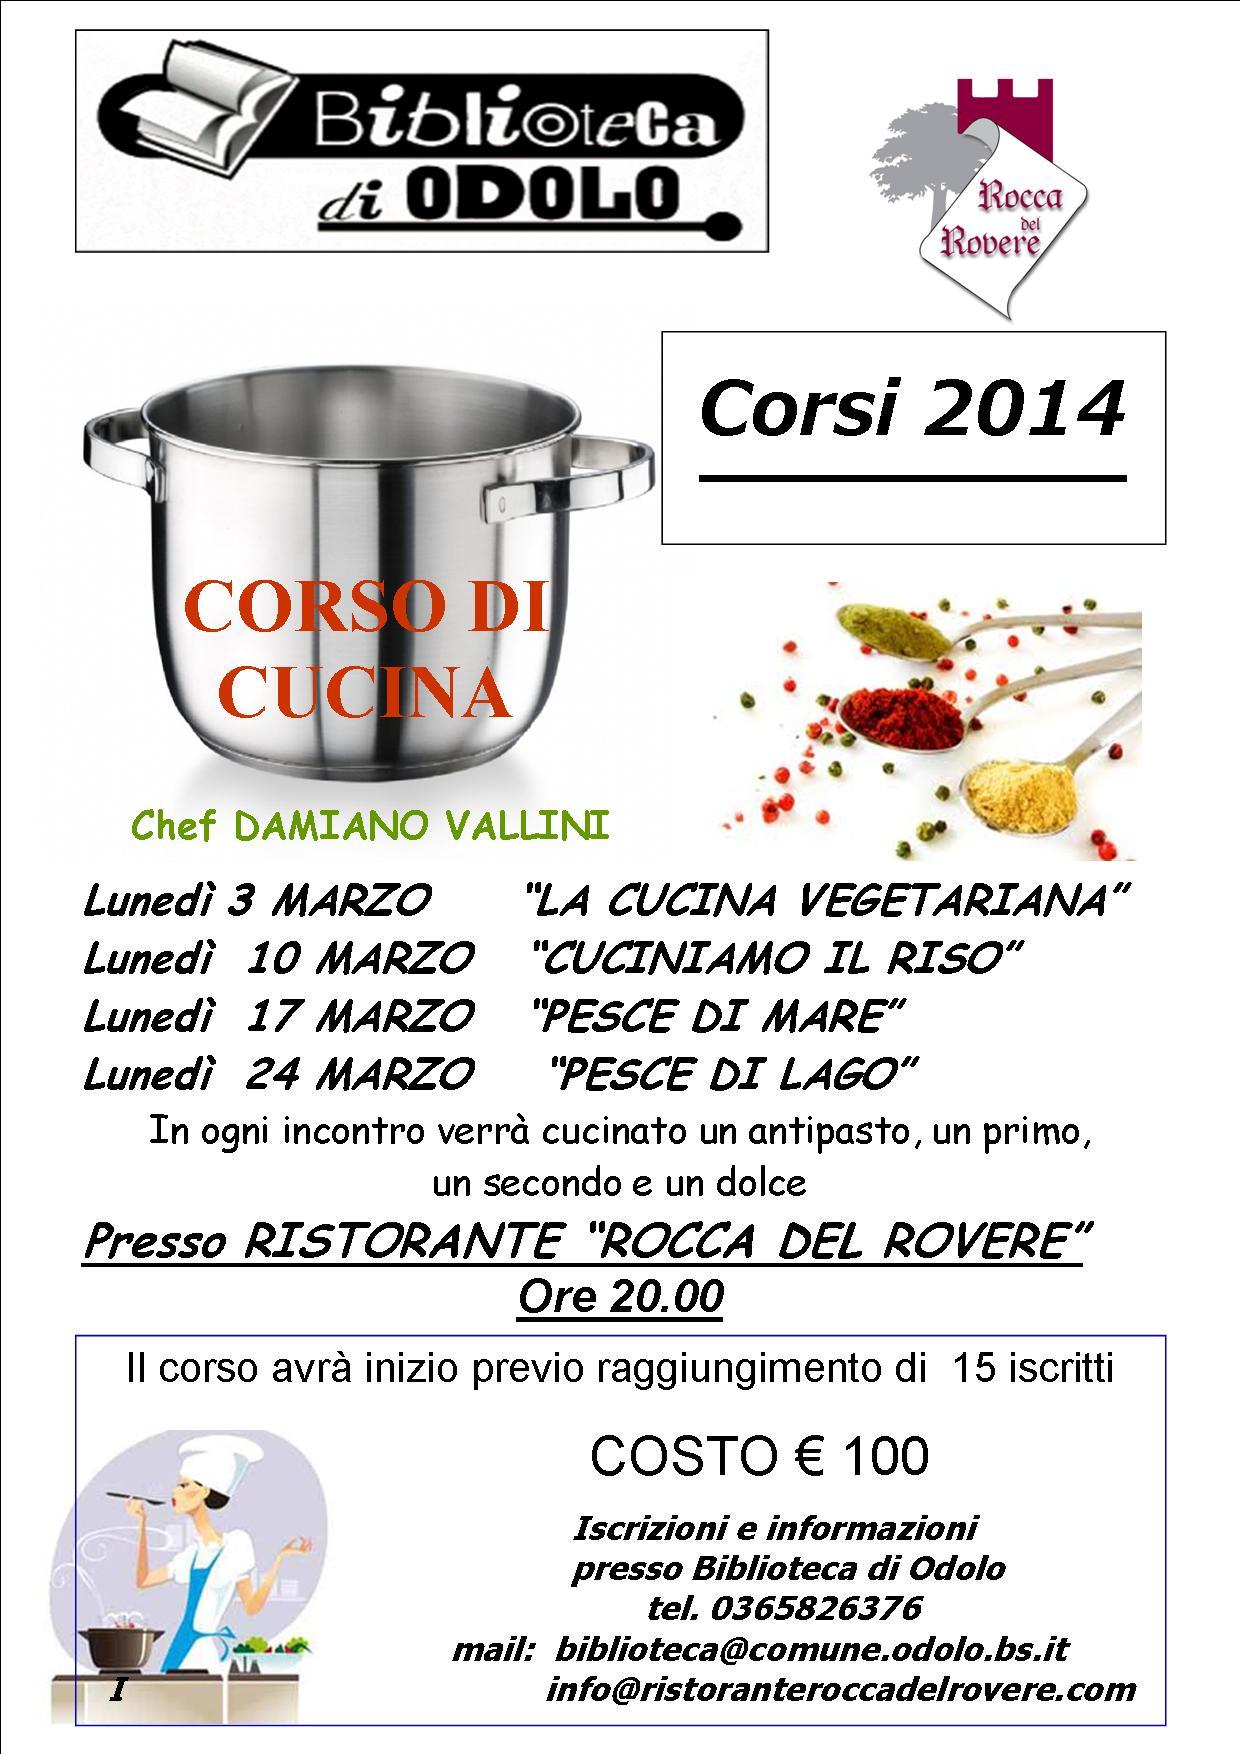 Corso cucina rete bibliotecaria bresciana e cremonese - Corso di cucina potenza ...